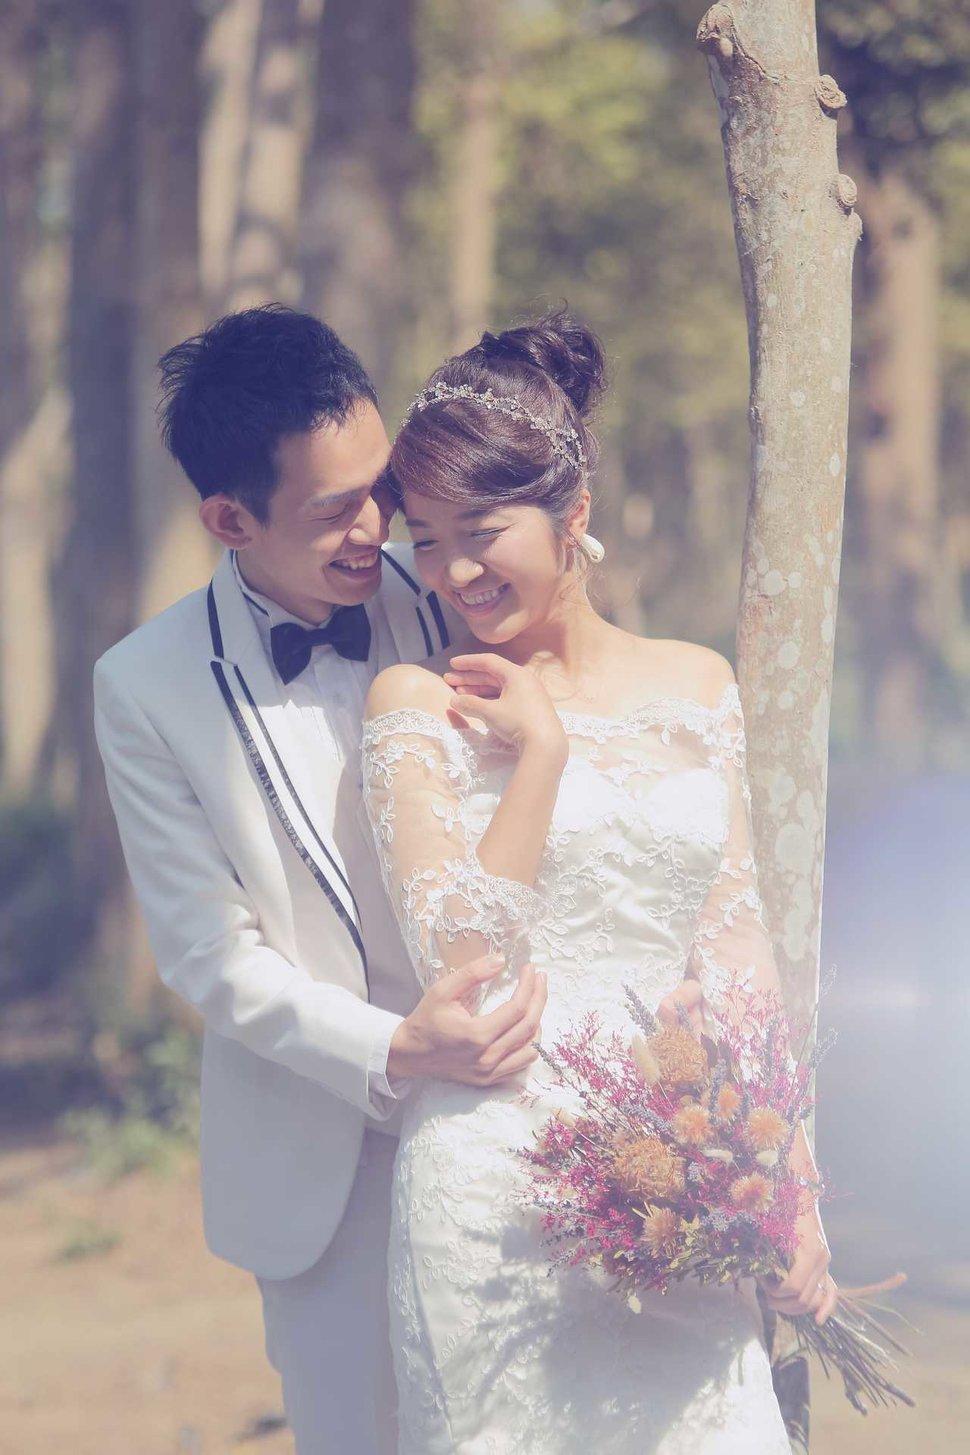 Wedding_Photo_2016_003 - 台南新秘Penny-新娘秘書《結婚吧》